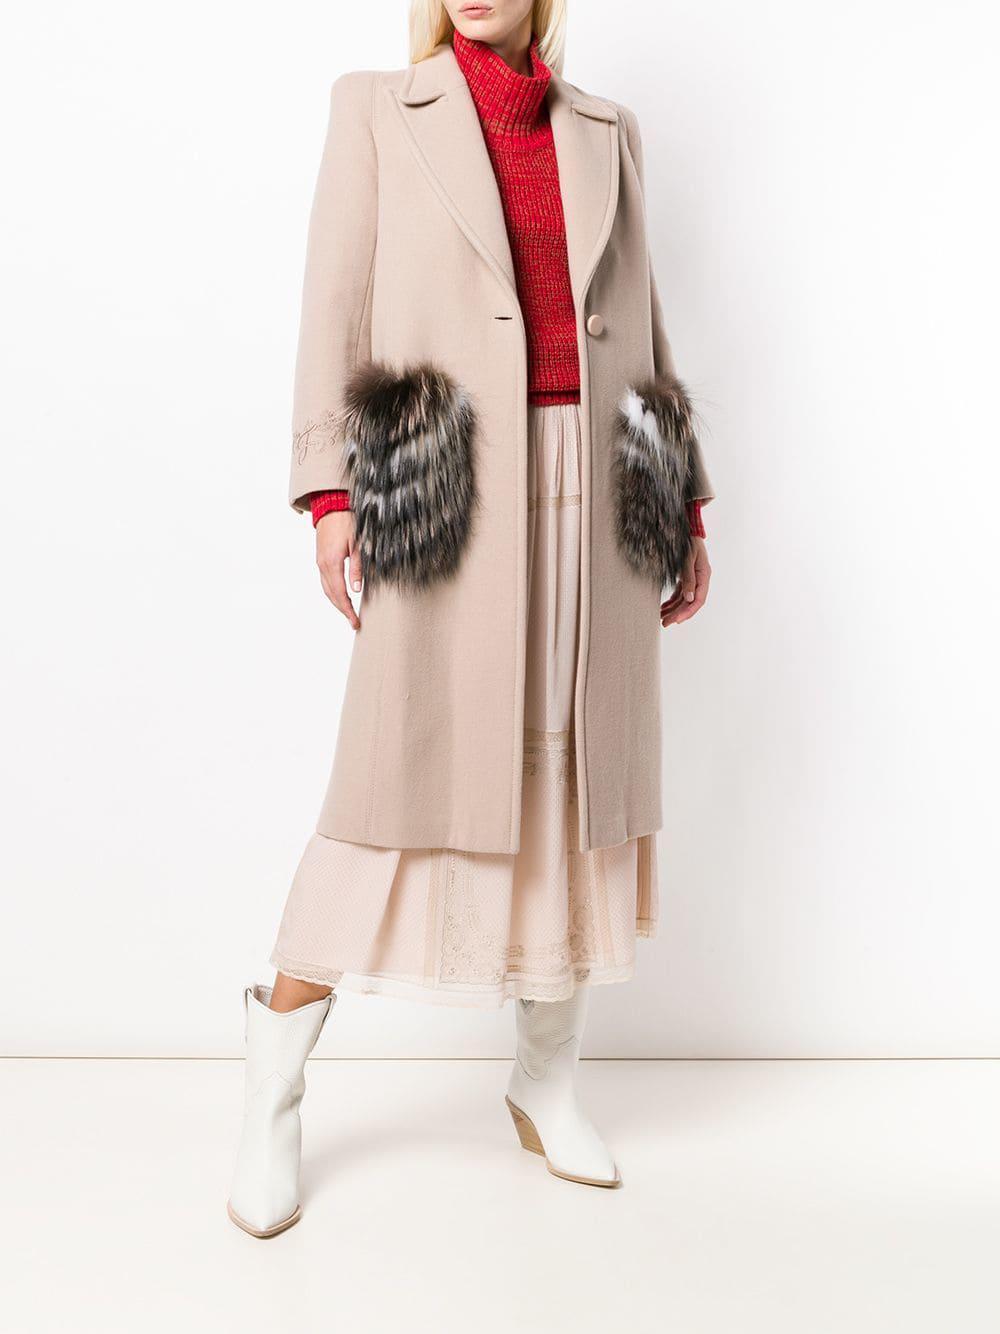 ecccac924a95 Lyst - Fendi Fur Pocket Single Breasted Coat